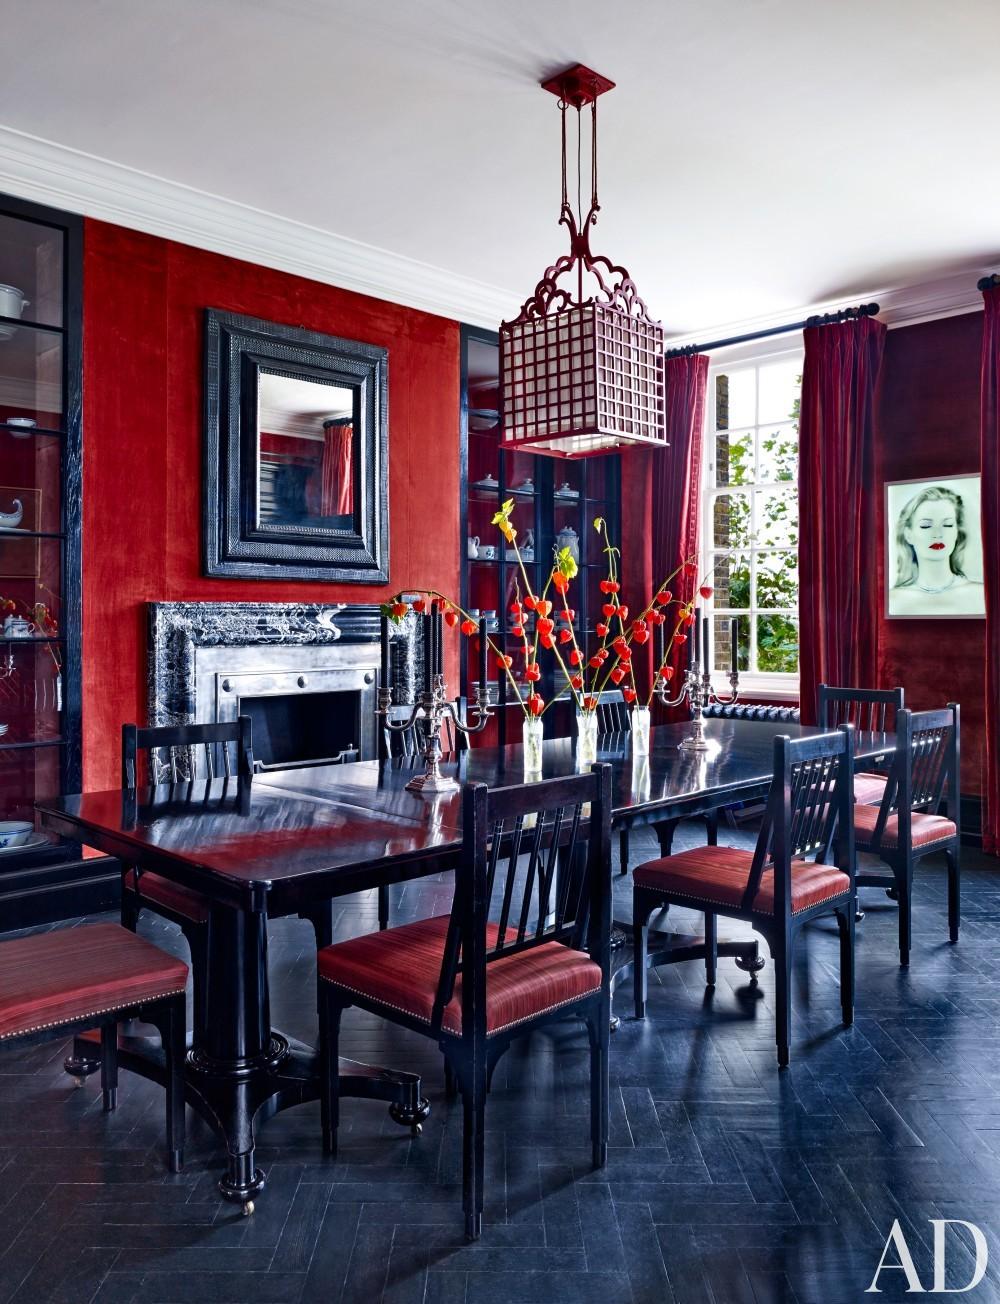 Modern Dining Room by Veere Grenney in London, UK